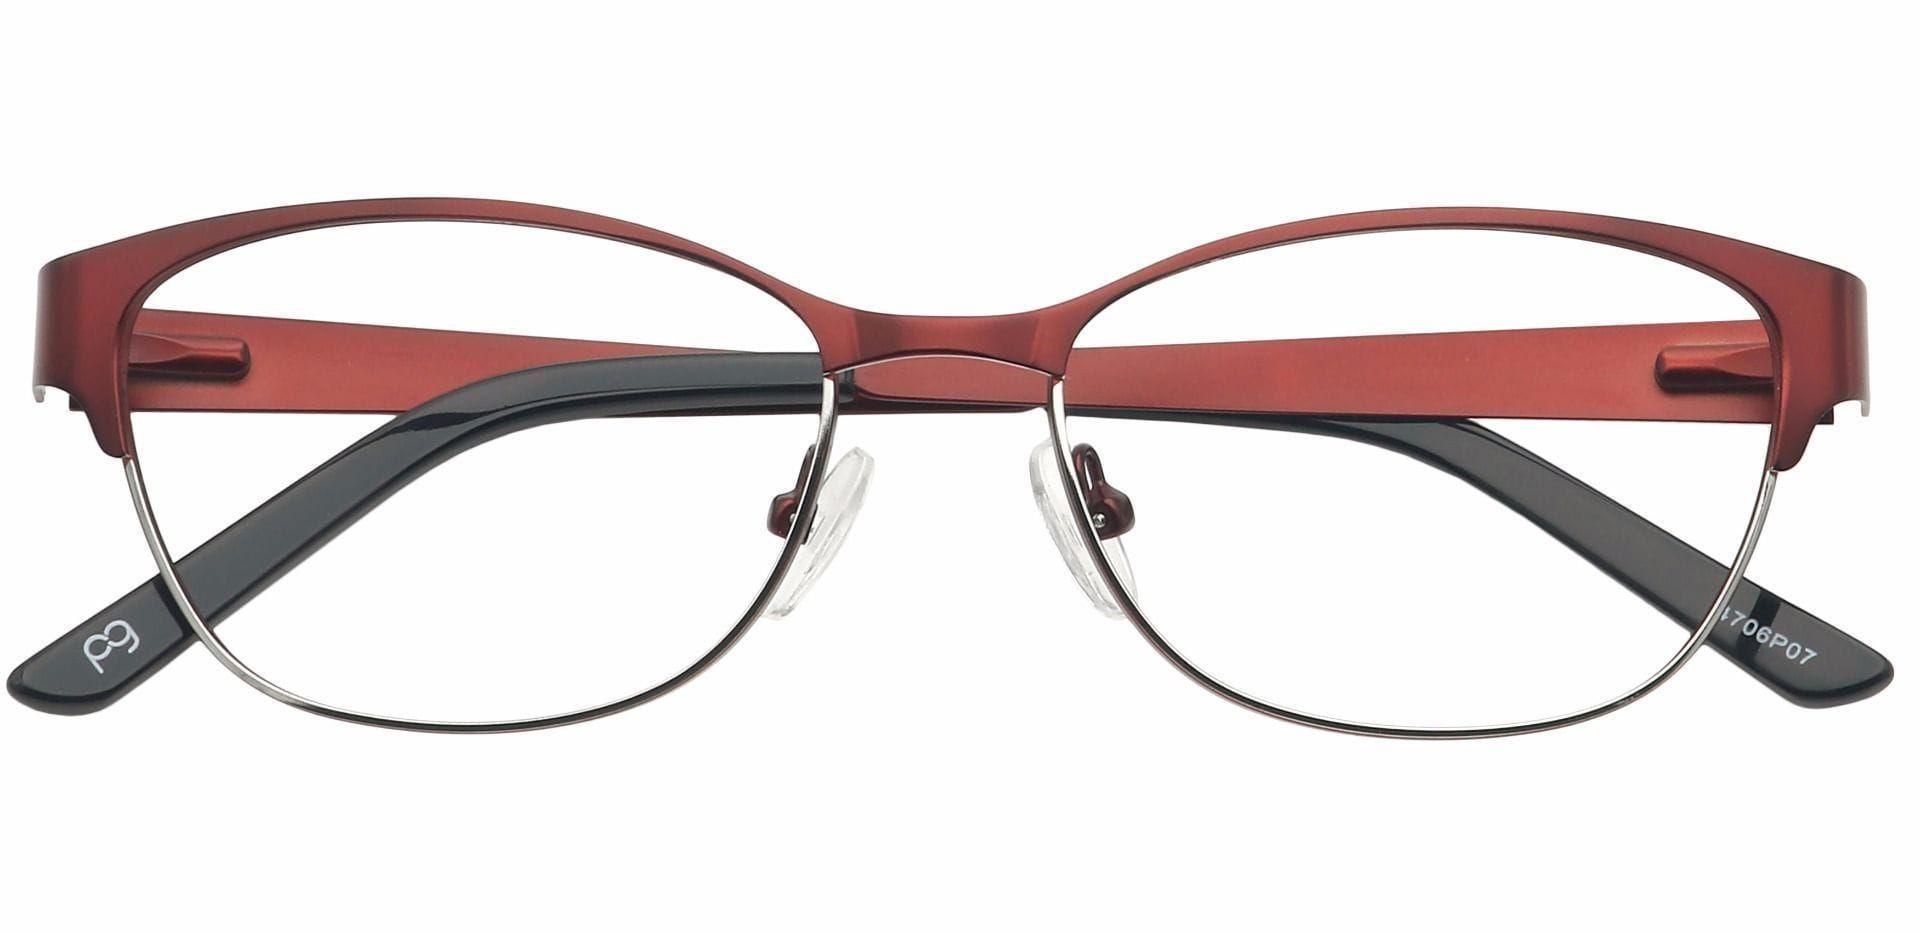 Verena Oval Prescription Glasses - Red